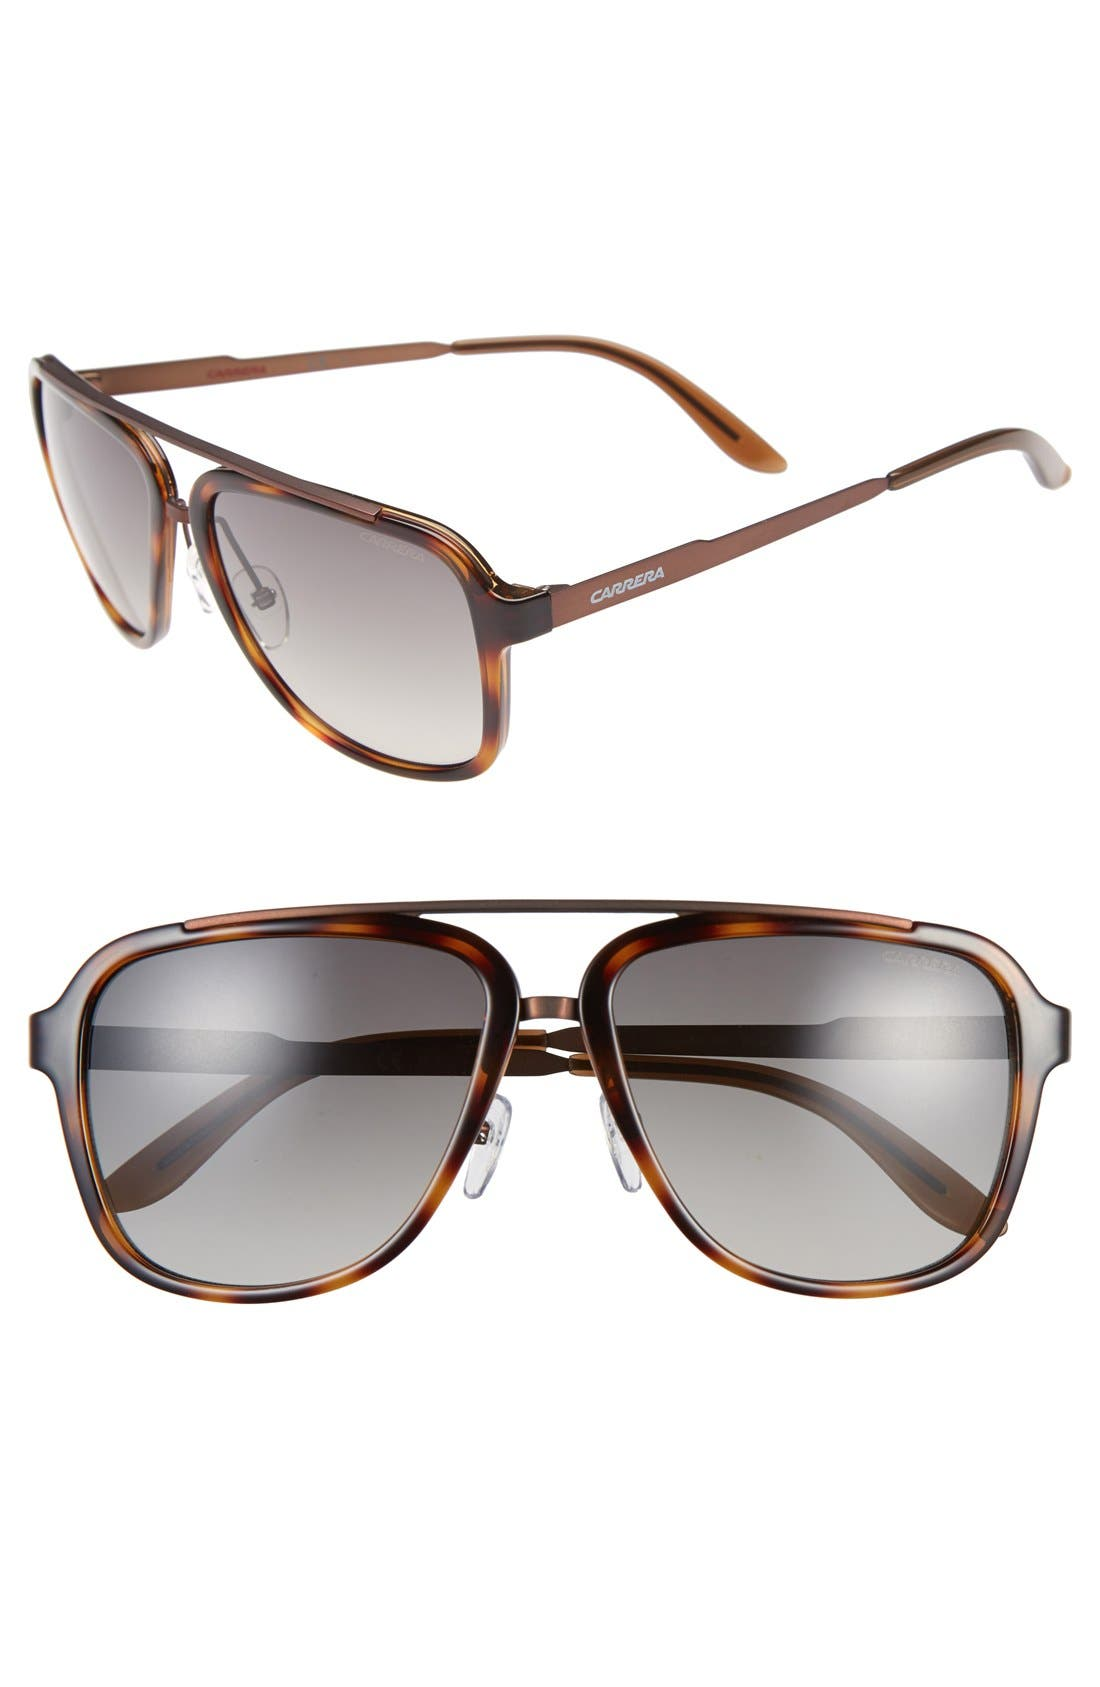 Main Image - Carrera Eyewear 57mm Navigator Sunglasses